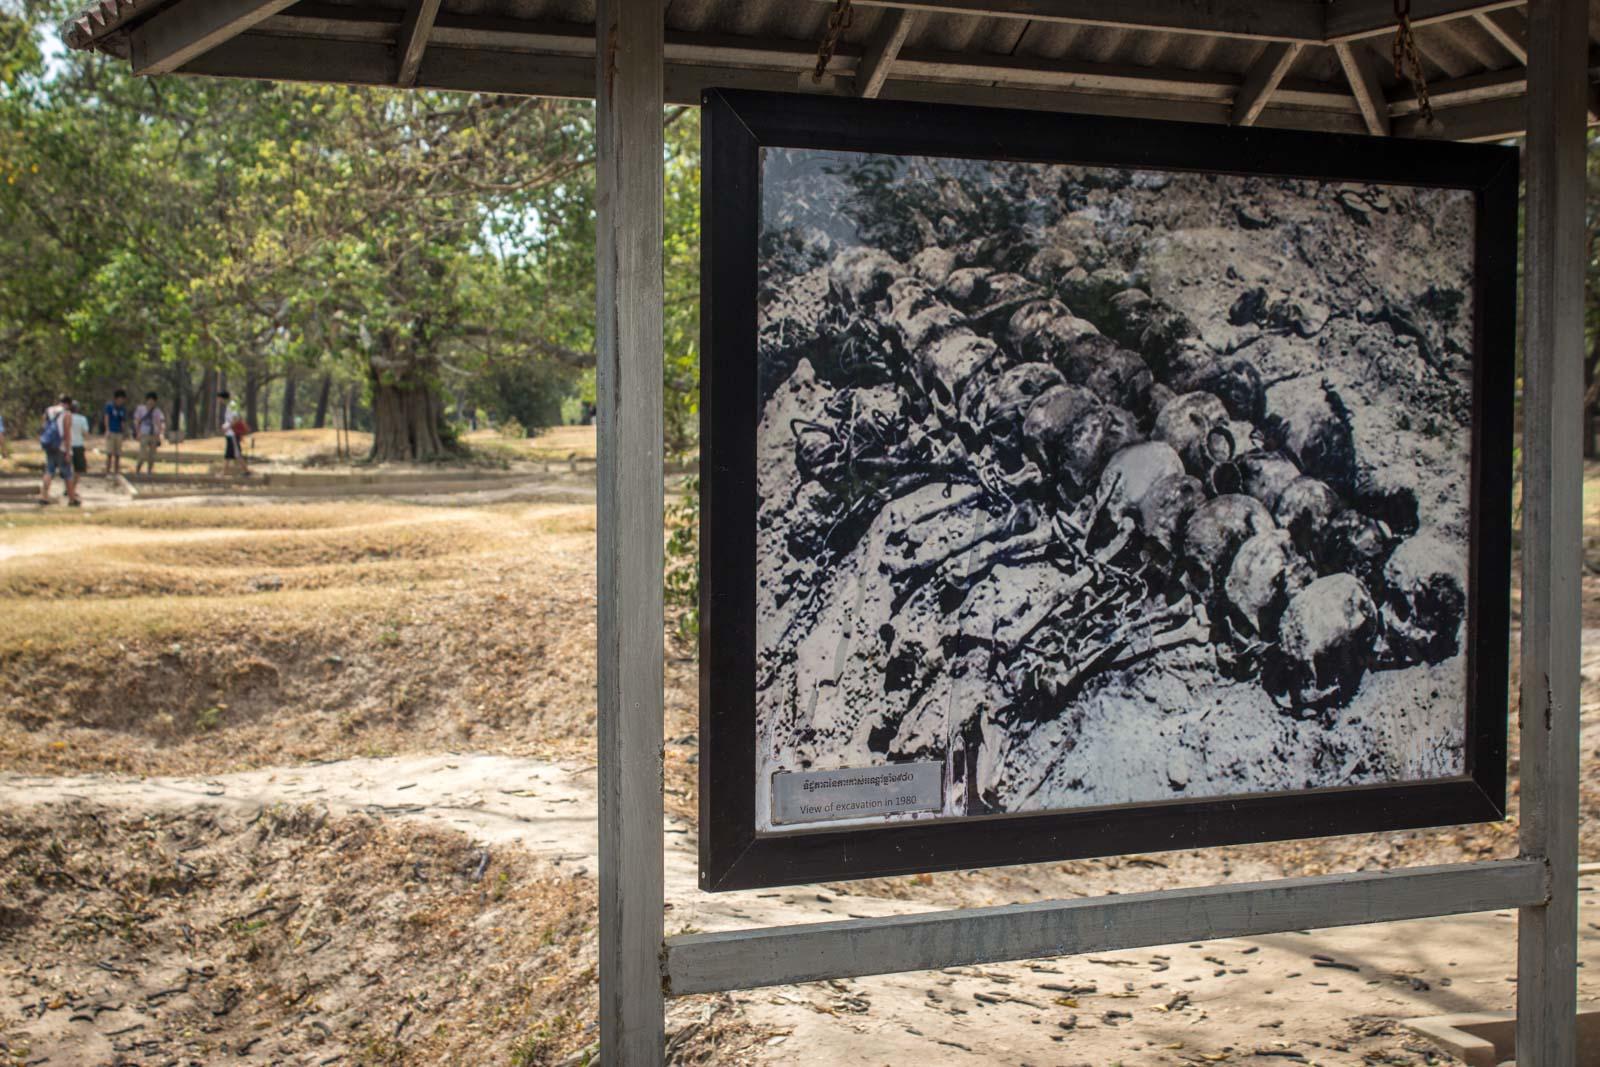 killing fields near phnom penh. choeung ek genocidal centre, cambodia